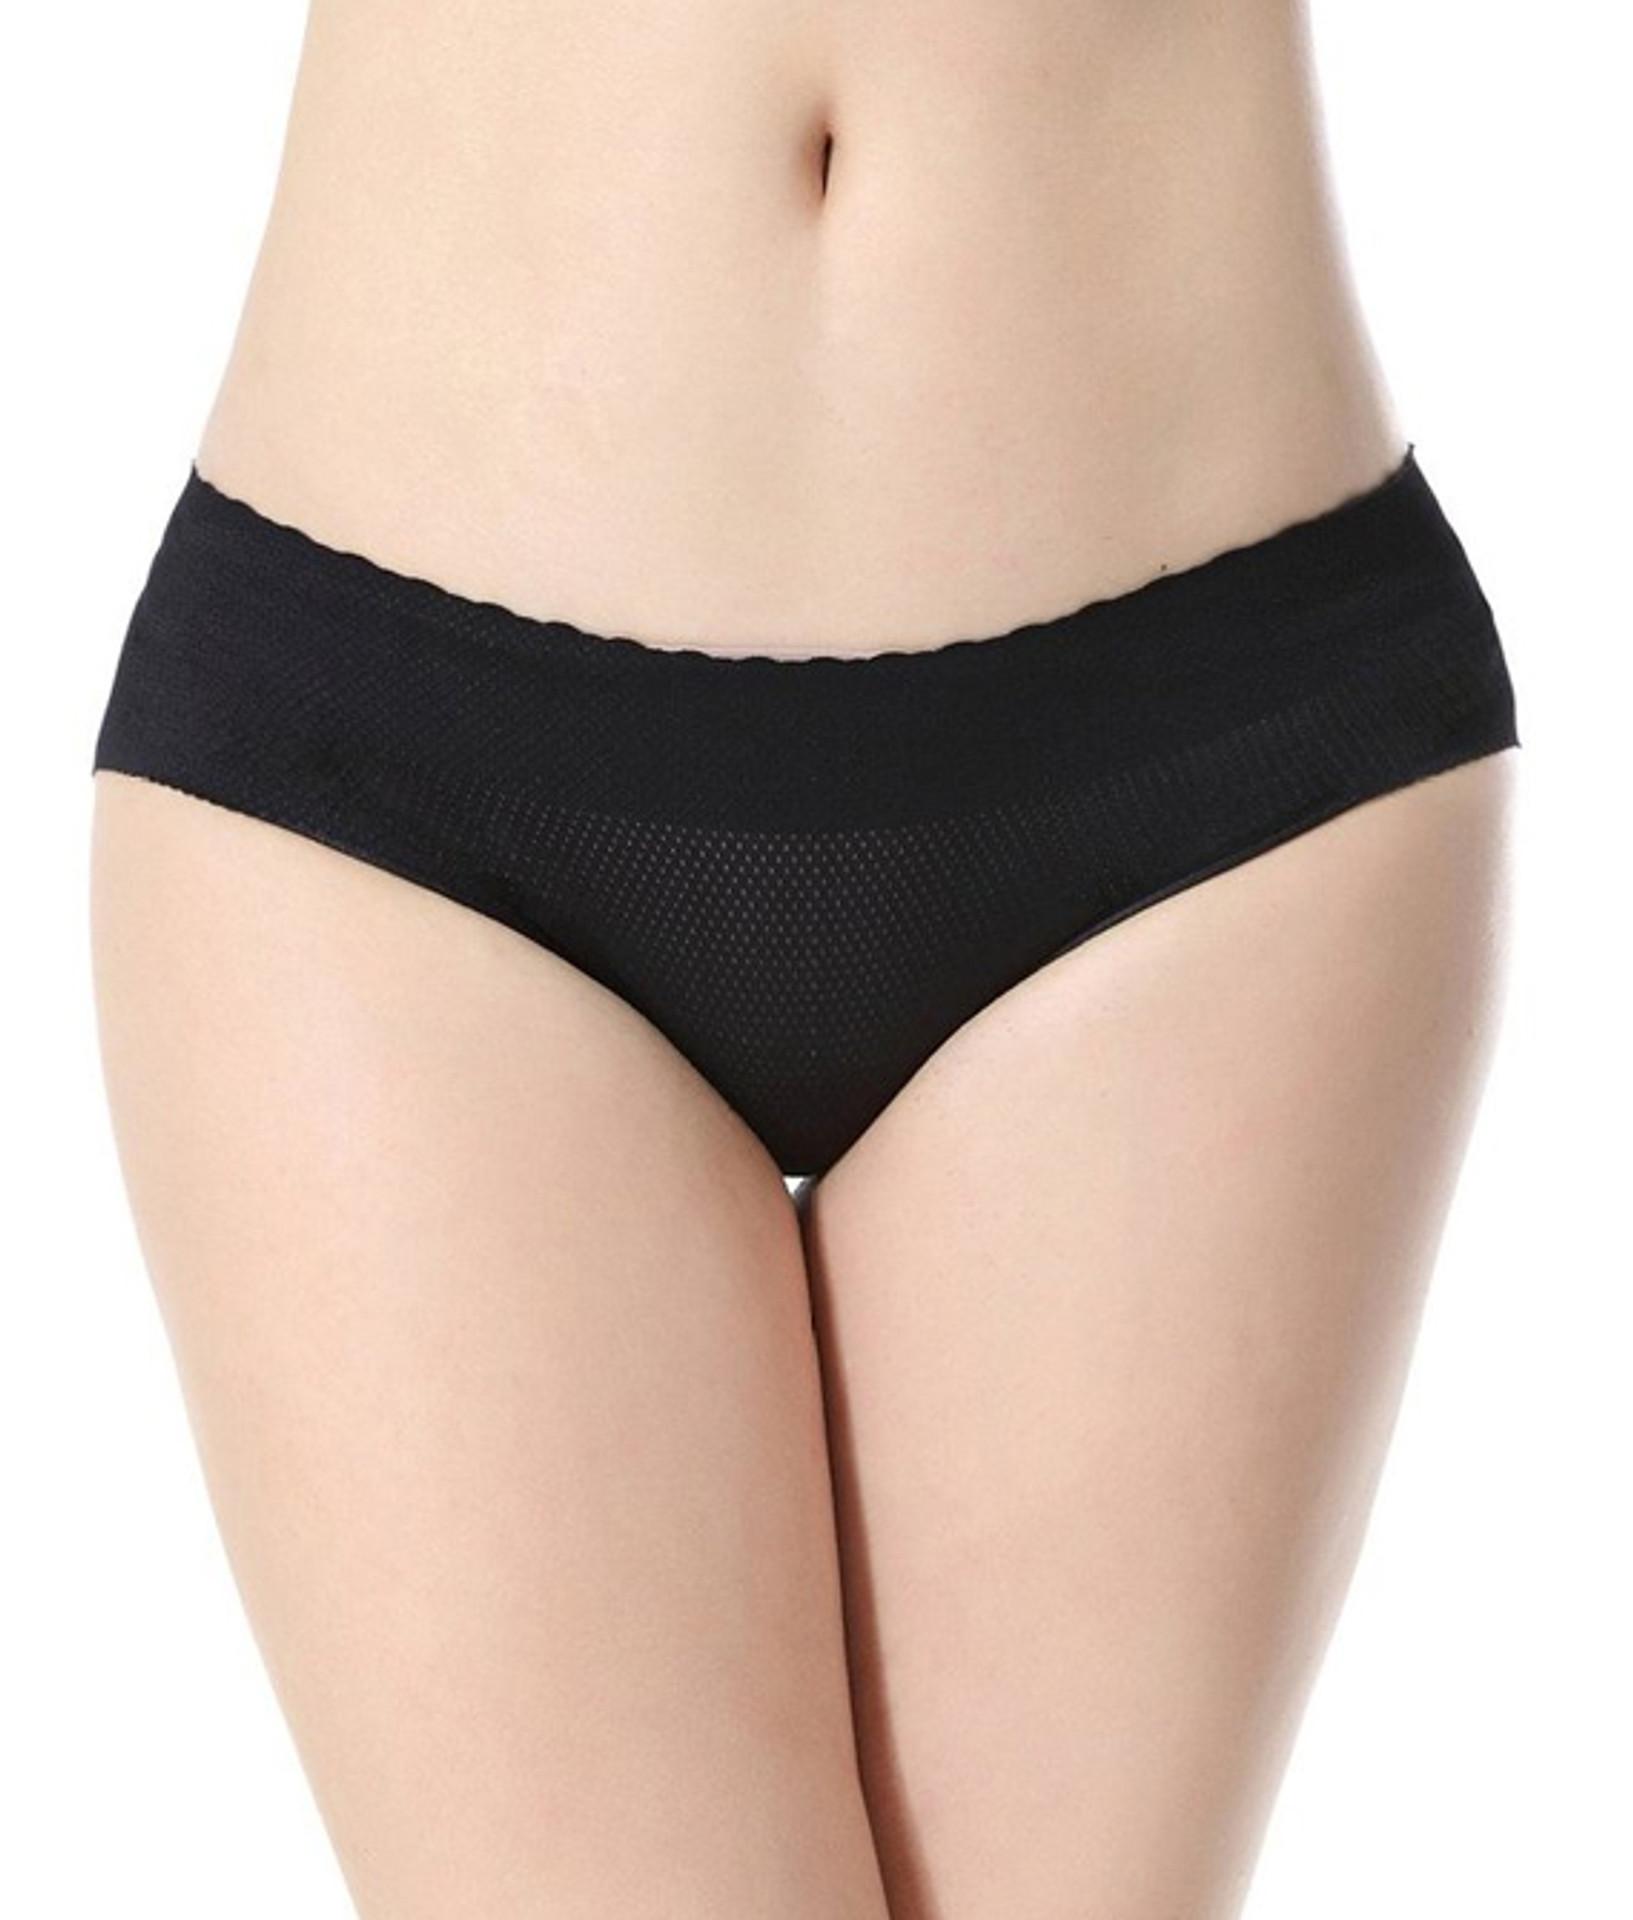 Sexy Flexy™️ Insta Booty Laser Cut Seamless Mid Waist Buttocks Enhancer Panty